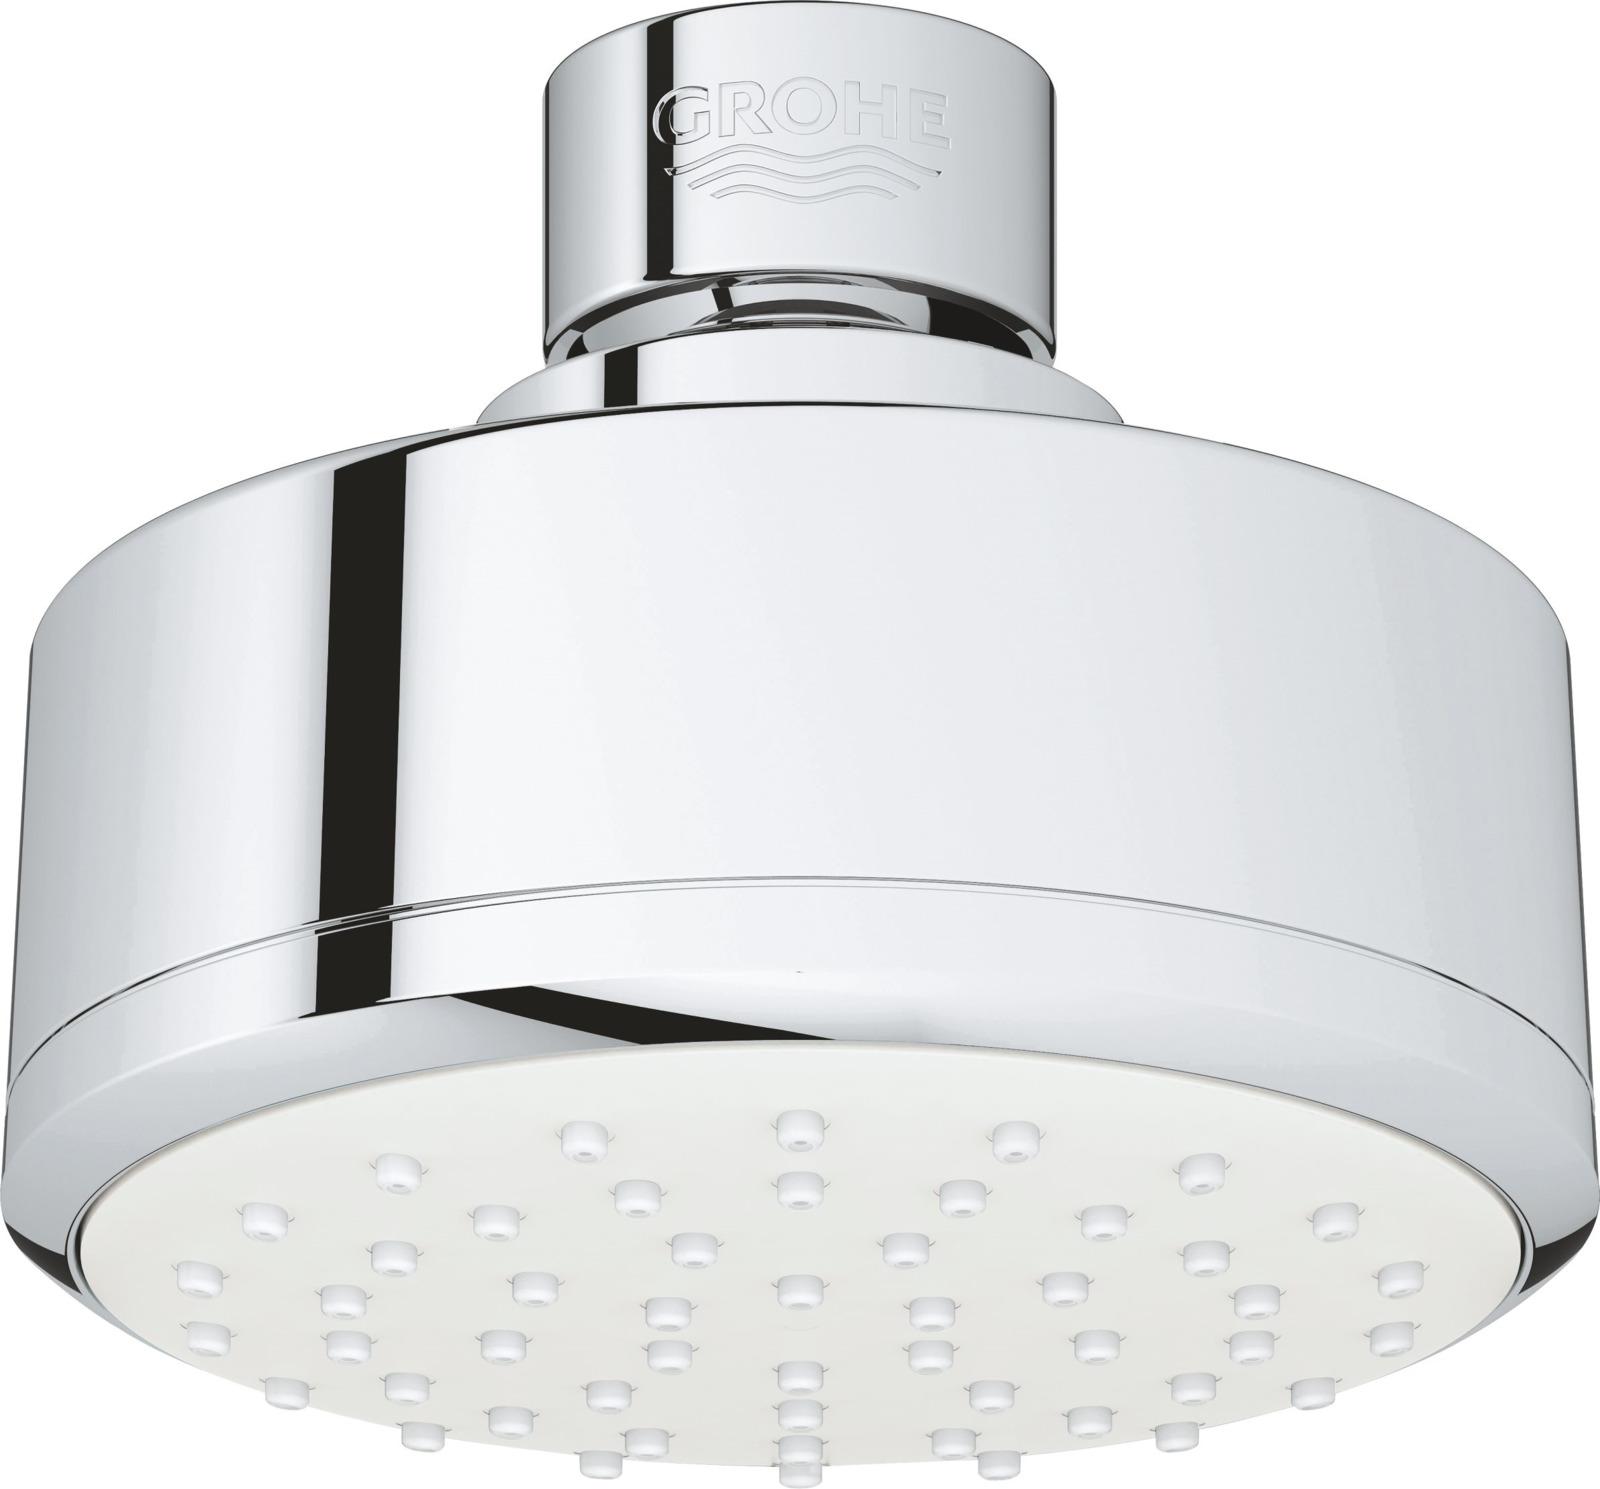 Верхний душ Grohe New Tempesta Cosmopolitan 100 I, 26366001, серебристый цена